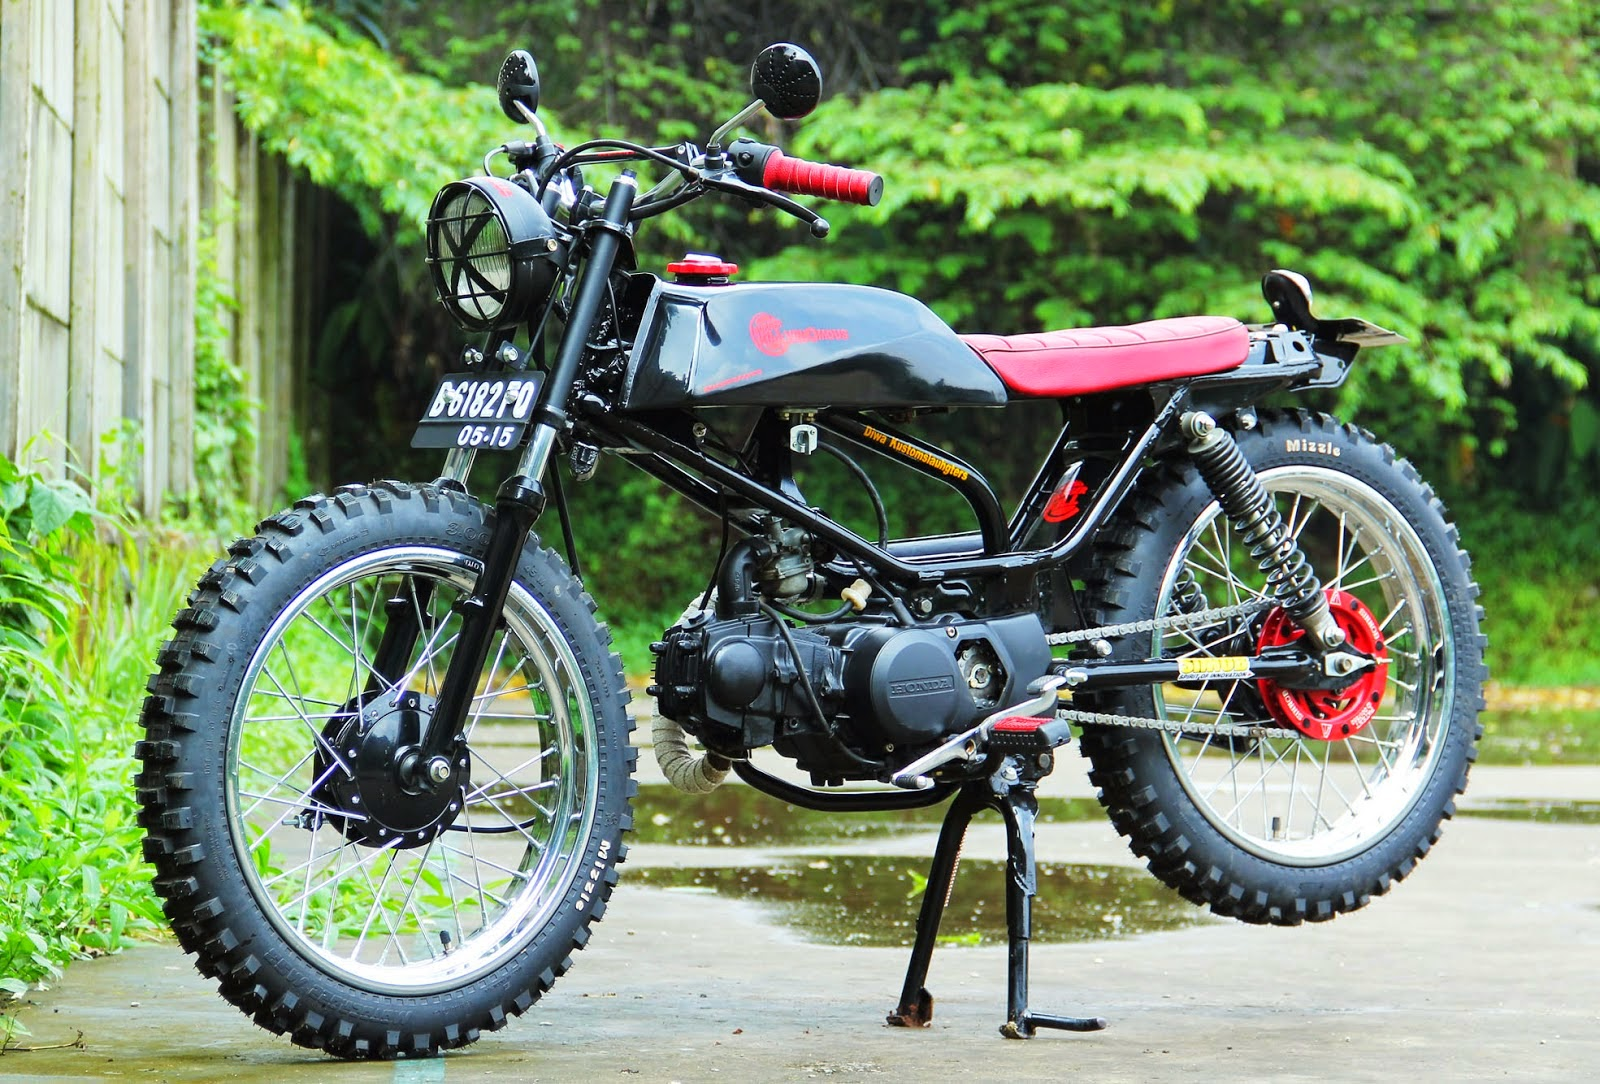 Koleksi Contoh Modifikasi Motor Honda Win Di Motor Dinas